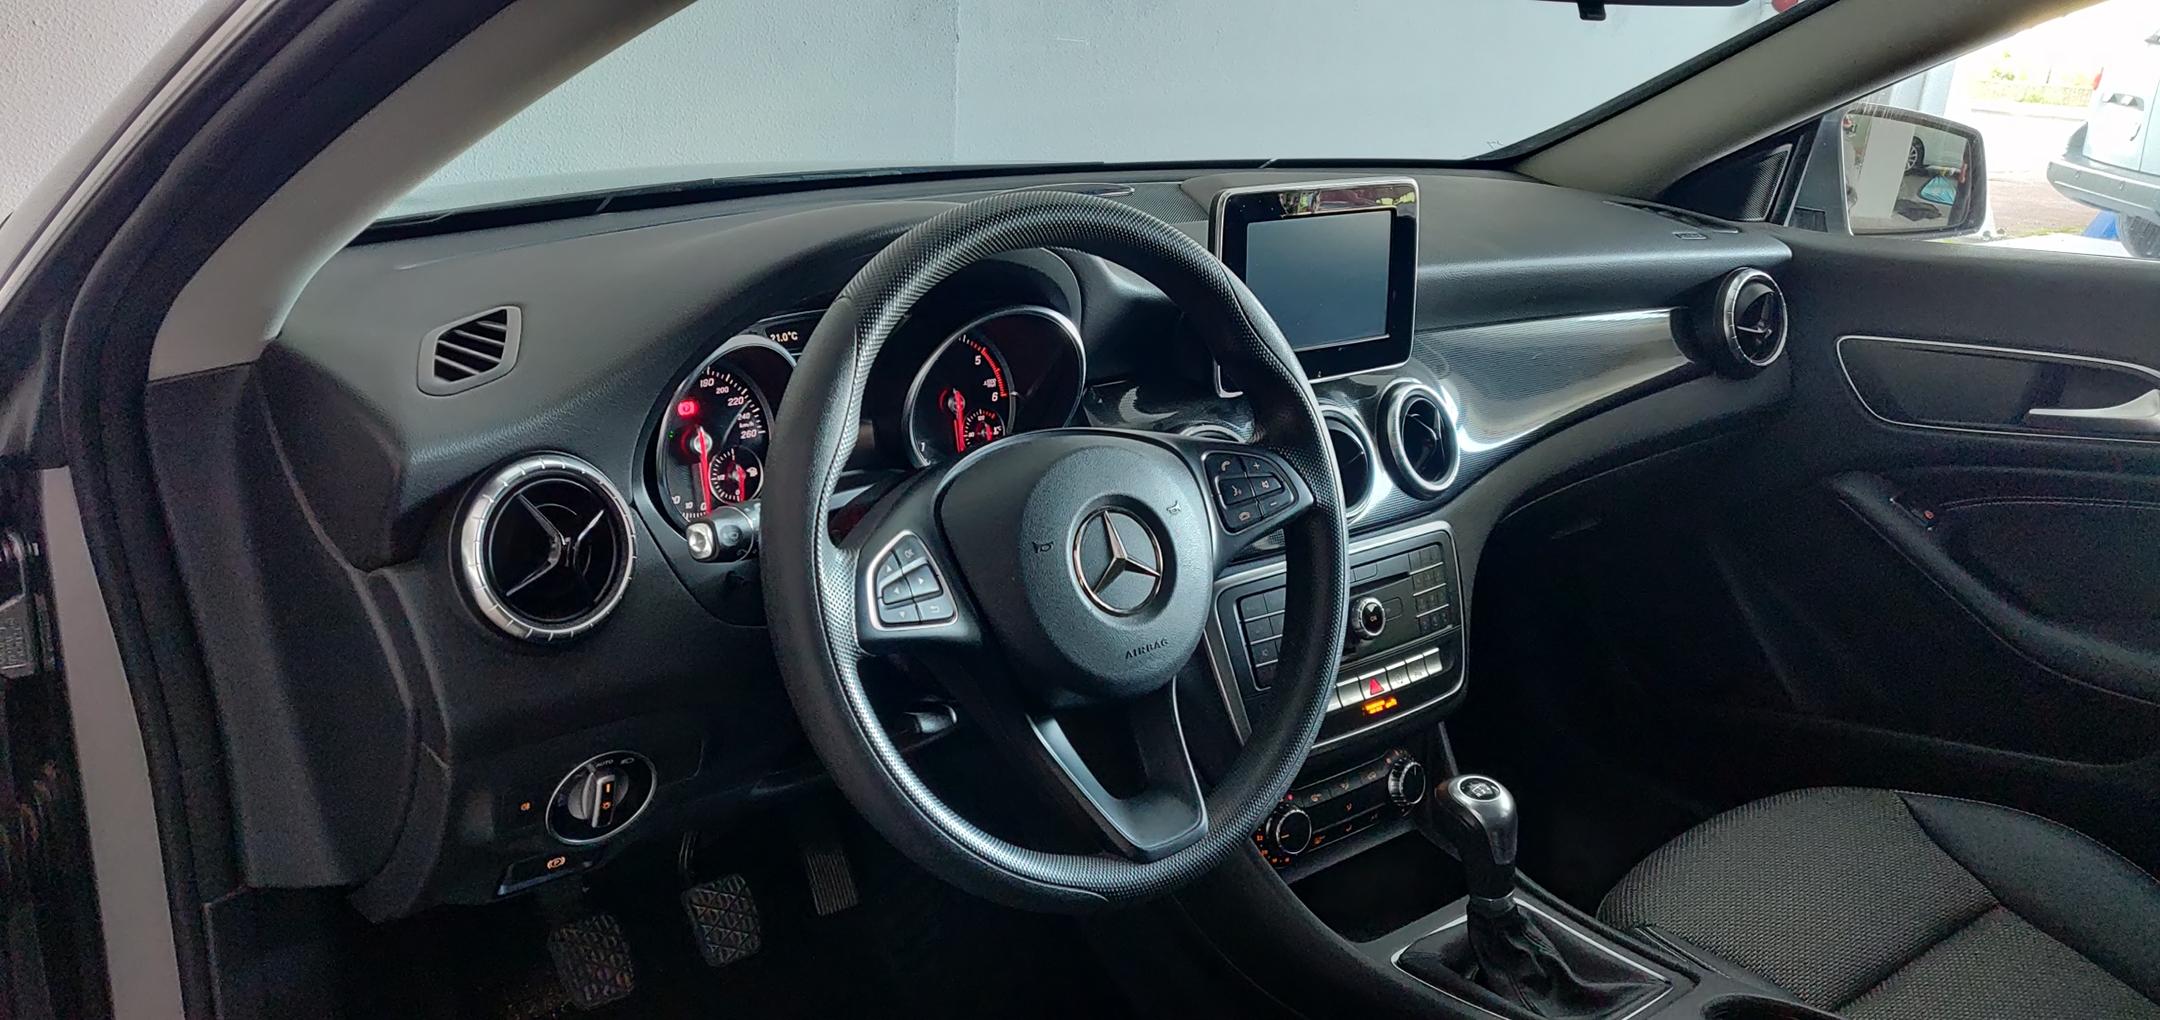 Mercedes-Benz CLA 180 1.5 Style | Imagem 9